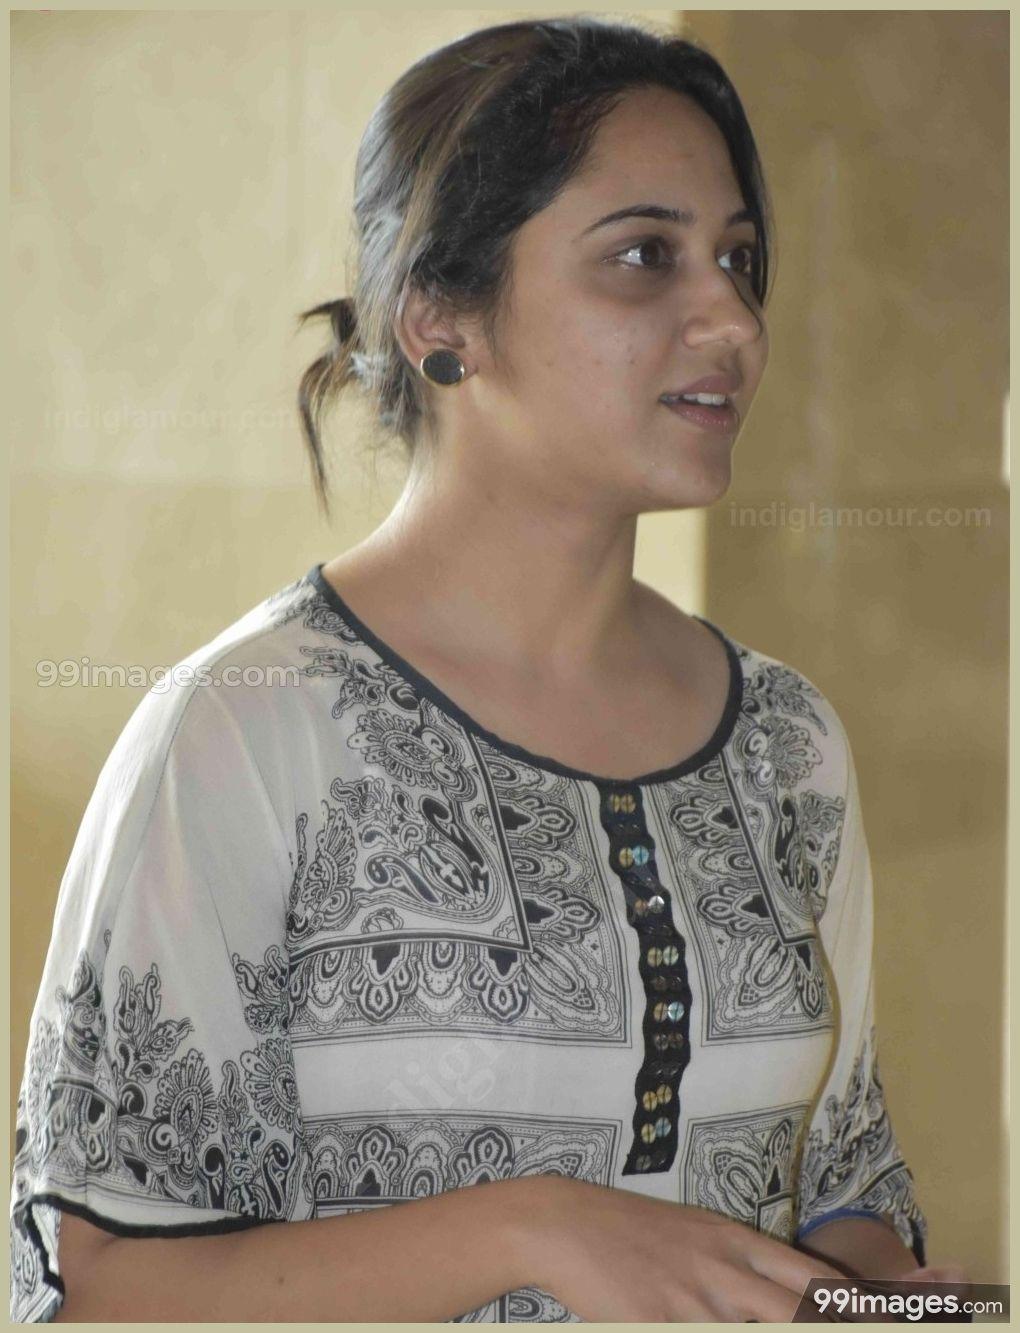 Beautiful Indian Girl Hd Wallpapers 1080p - Beautiful Indian Girls , HD Wallpaper & Backgrounds